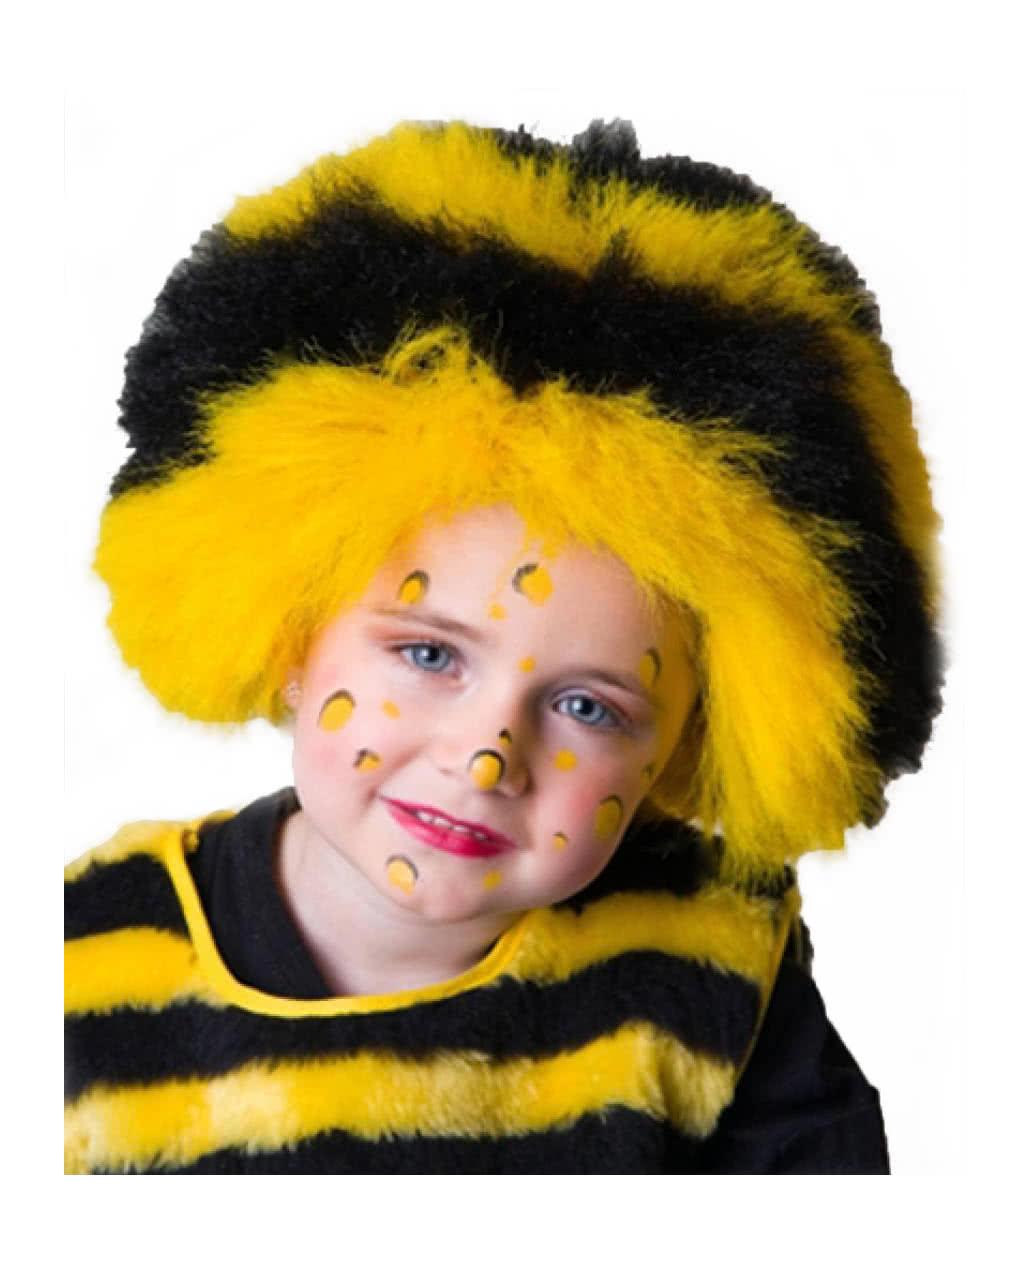 Bienen Perucke Fur Kinder Karneval Perucke Horror Shop Com